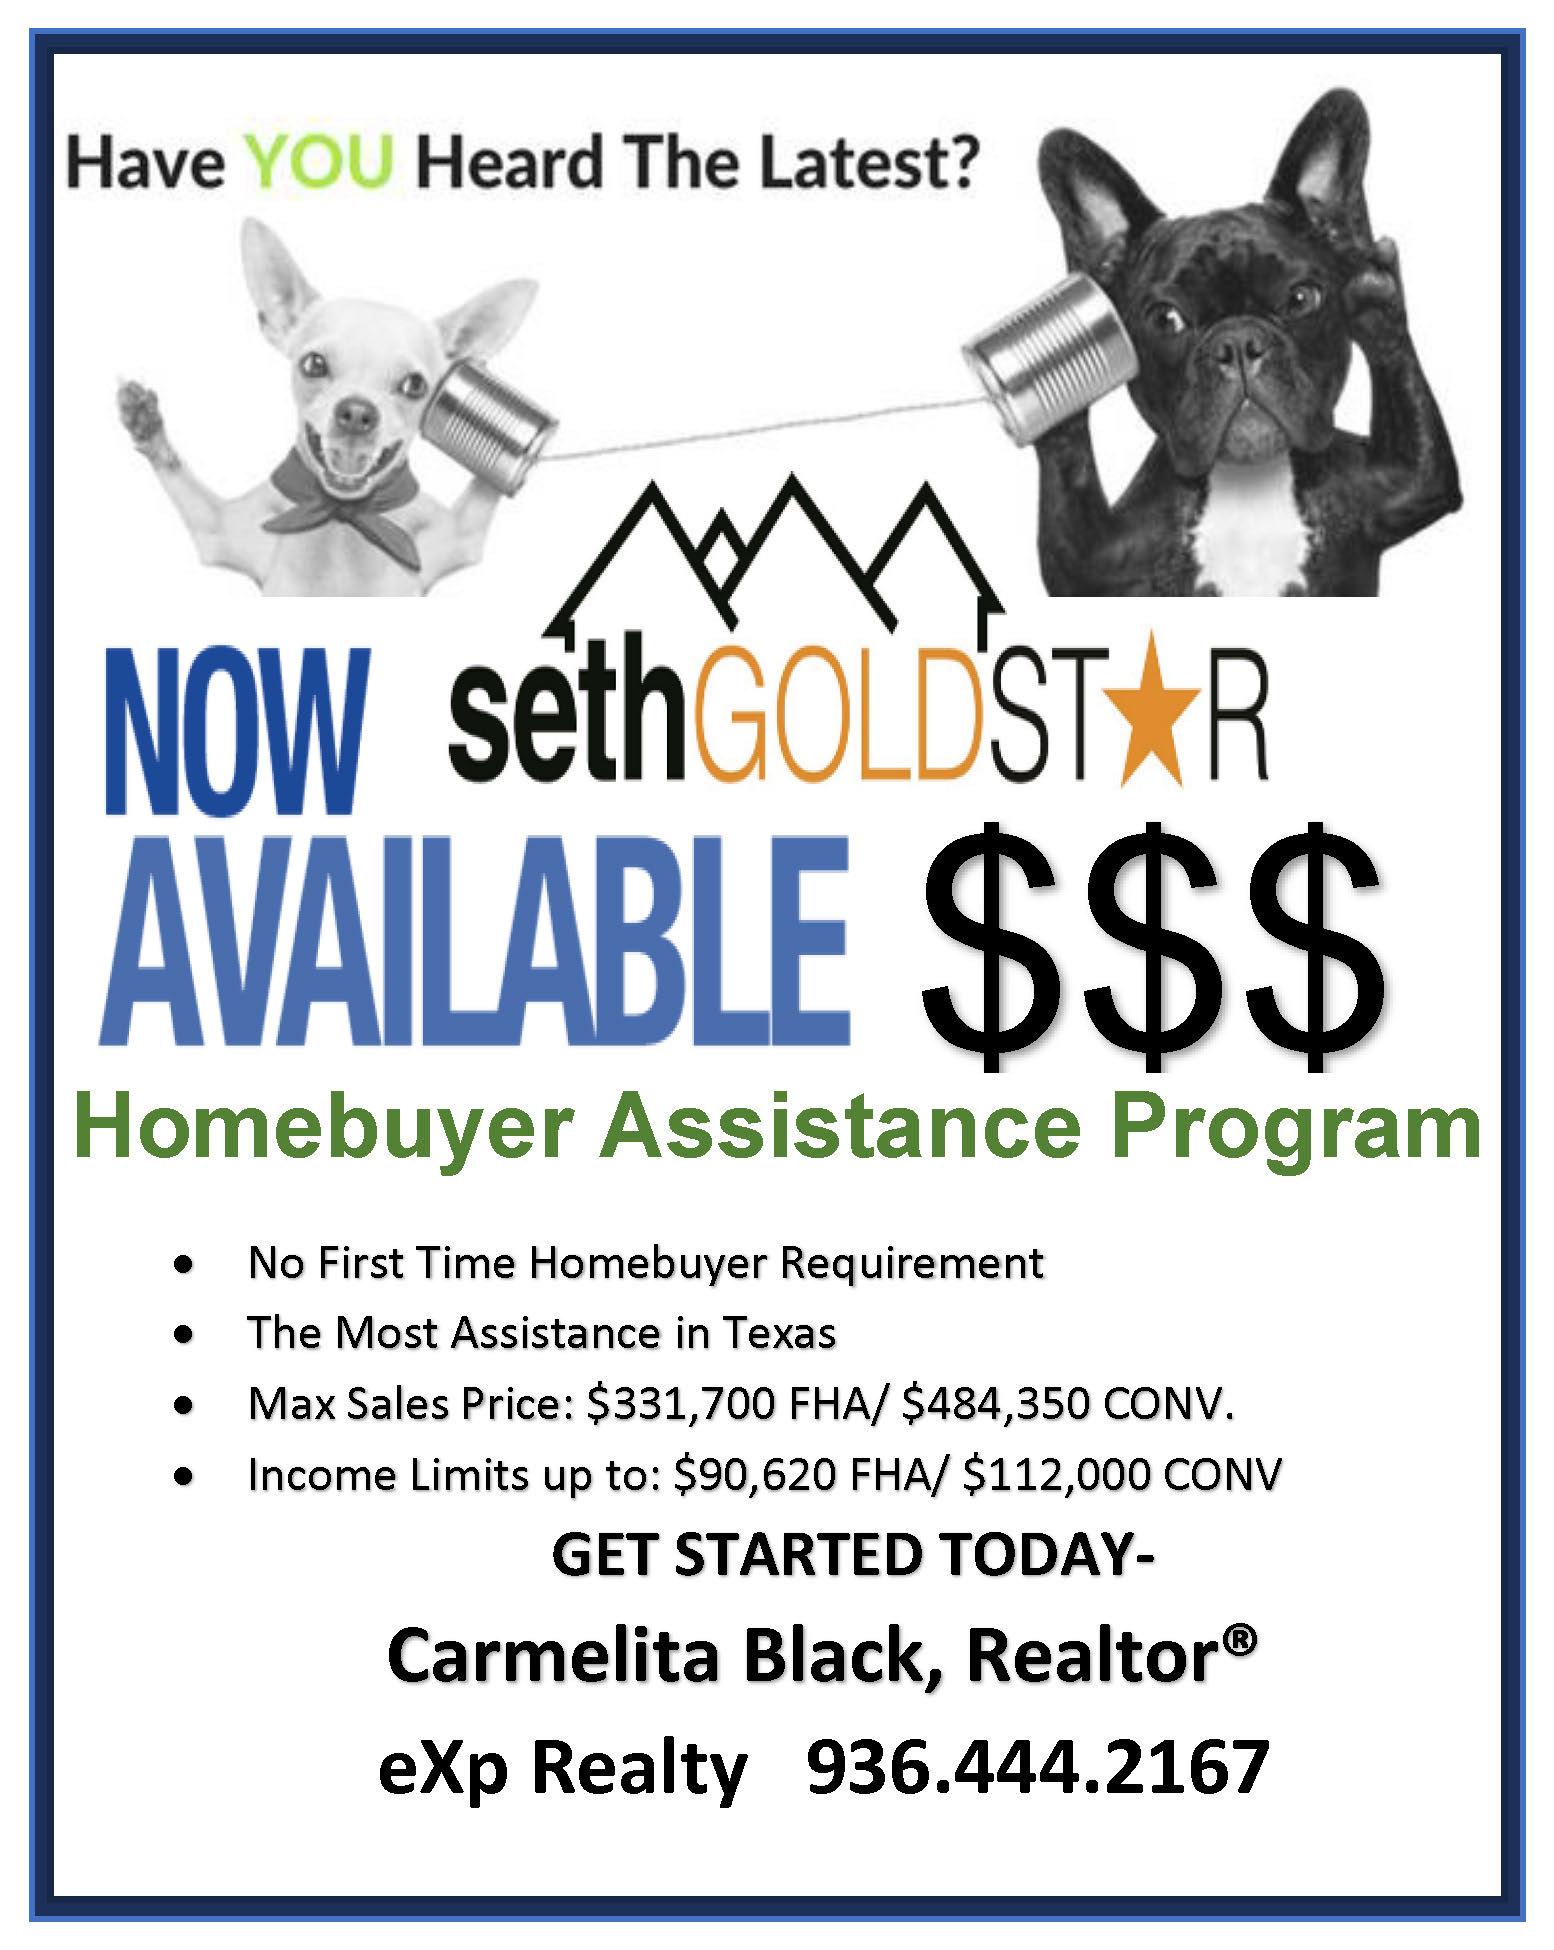 SETH Gold Star  Down Payment & Closing Cost Assistance Program - Carmelita Black REALTOR Brokered By eXp Realty - CarmelitaSellsHousesCom - 936-444-2167